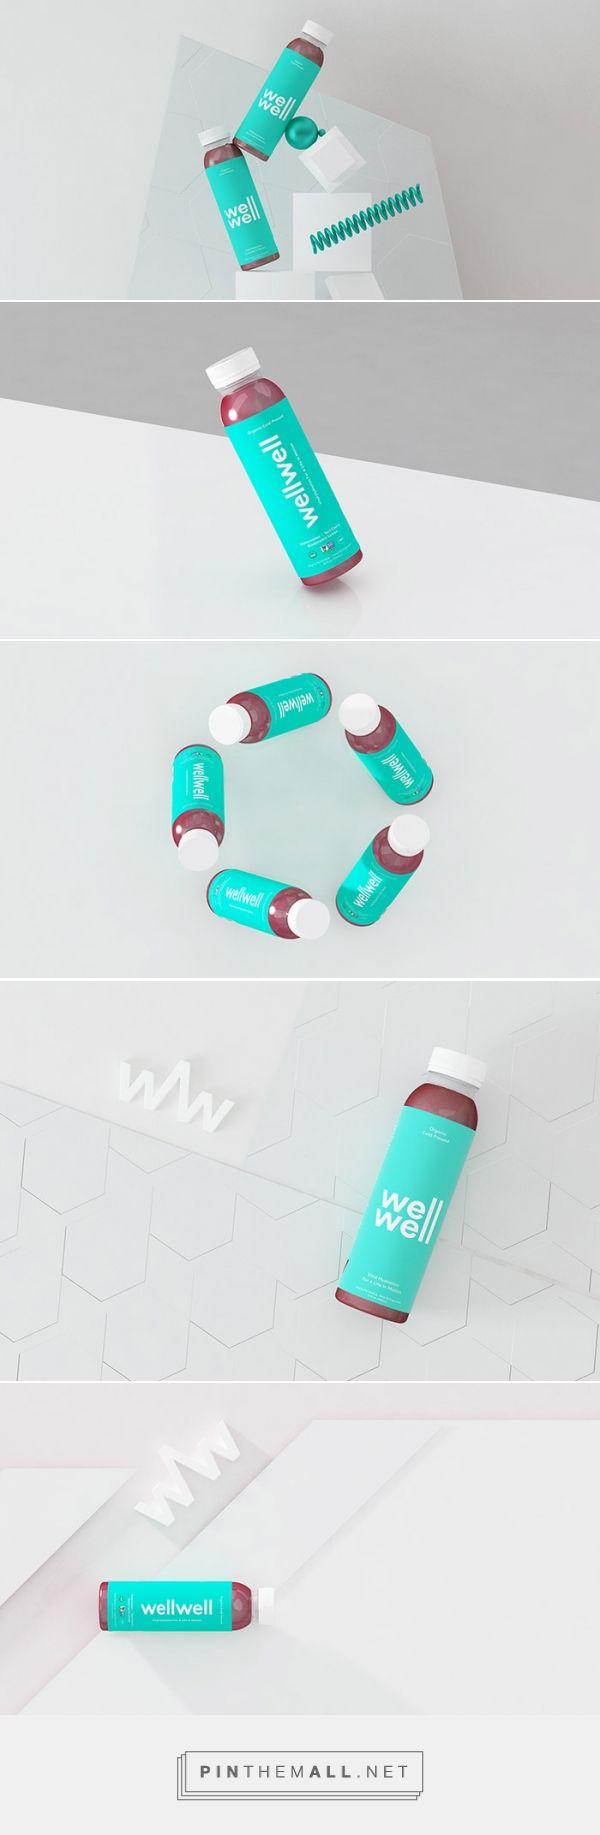 Well Well - Packaging renders for juice brand / designed by Danny Jones